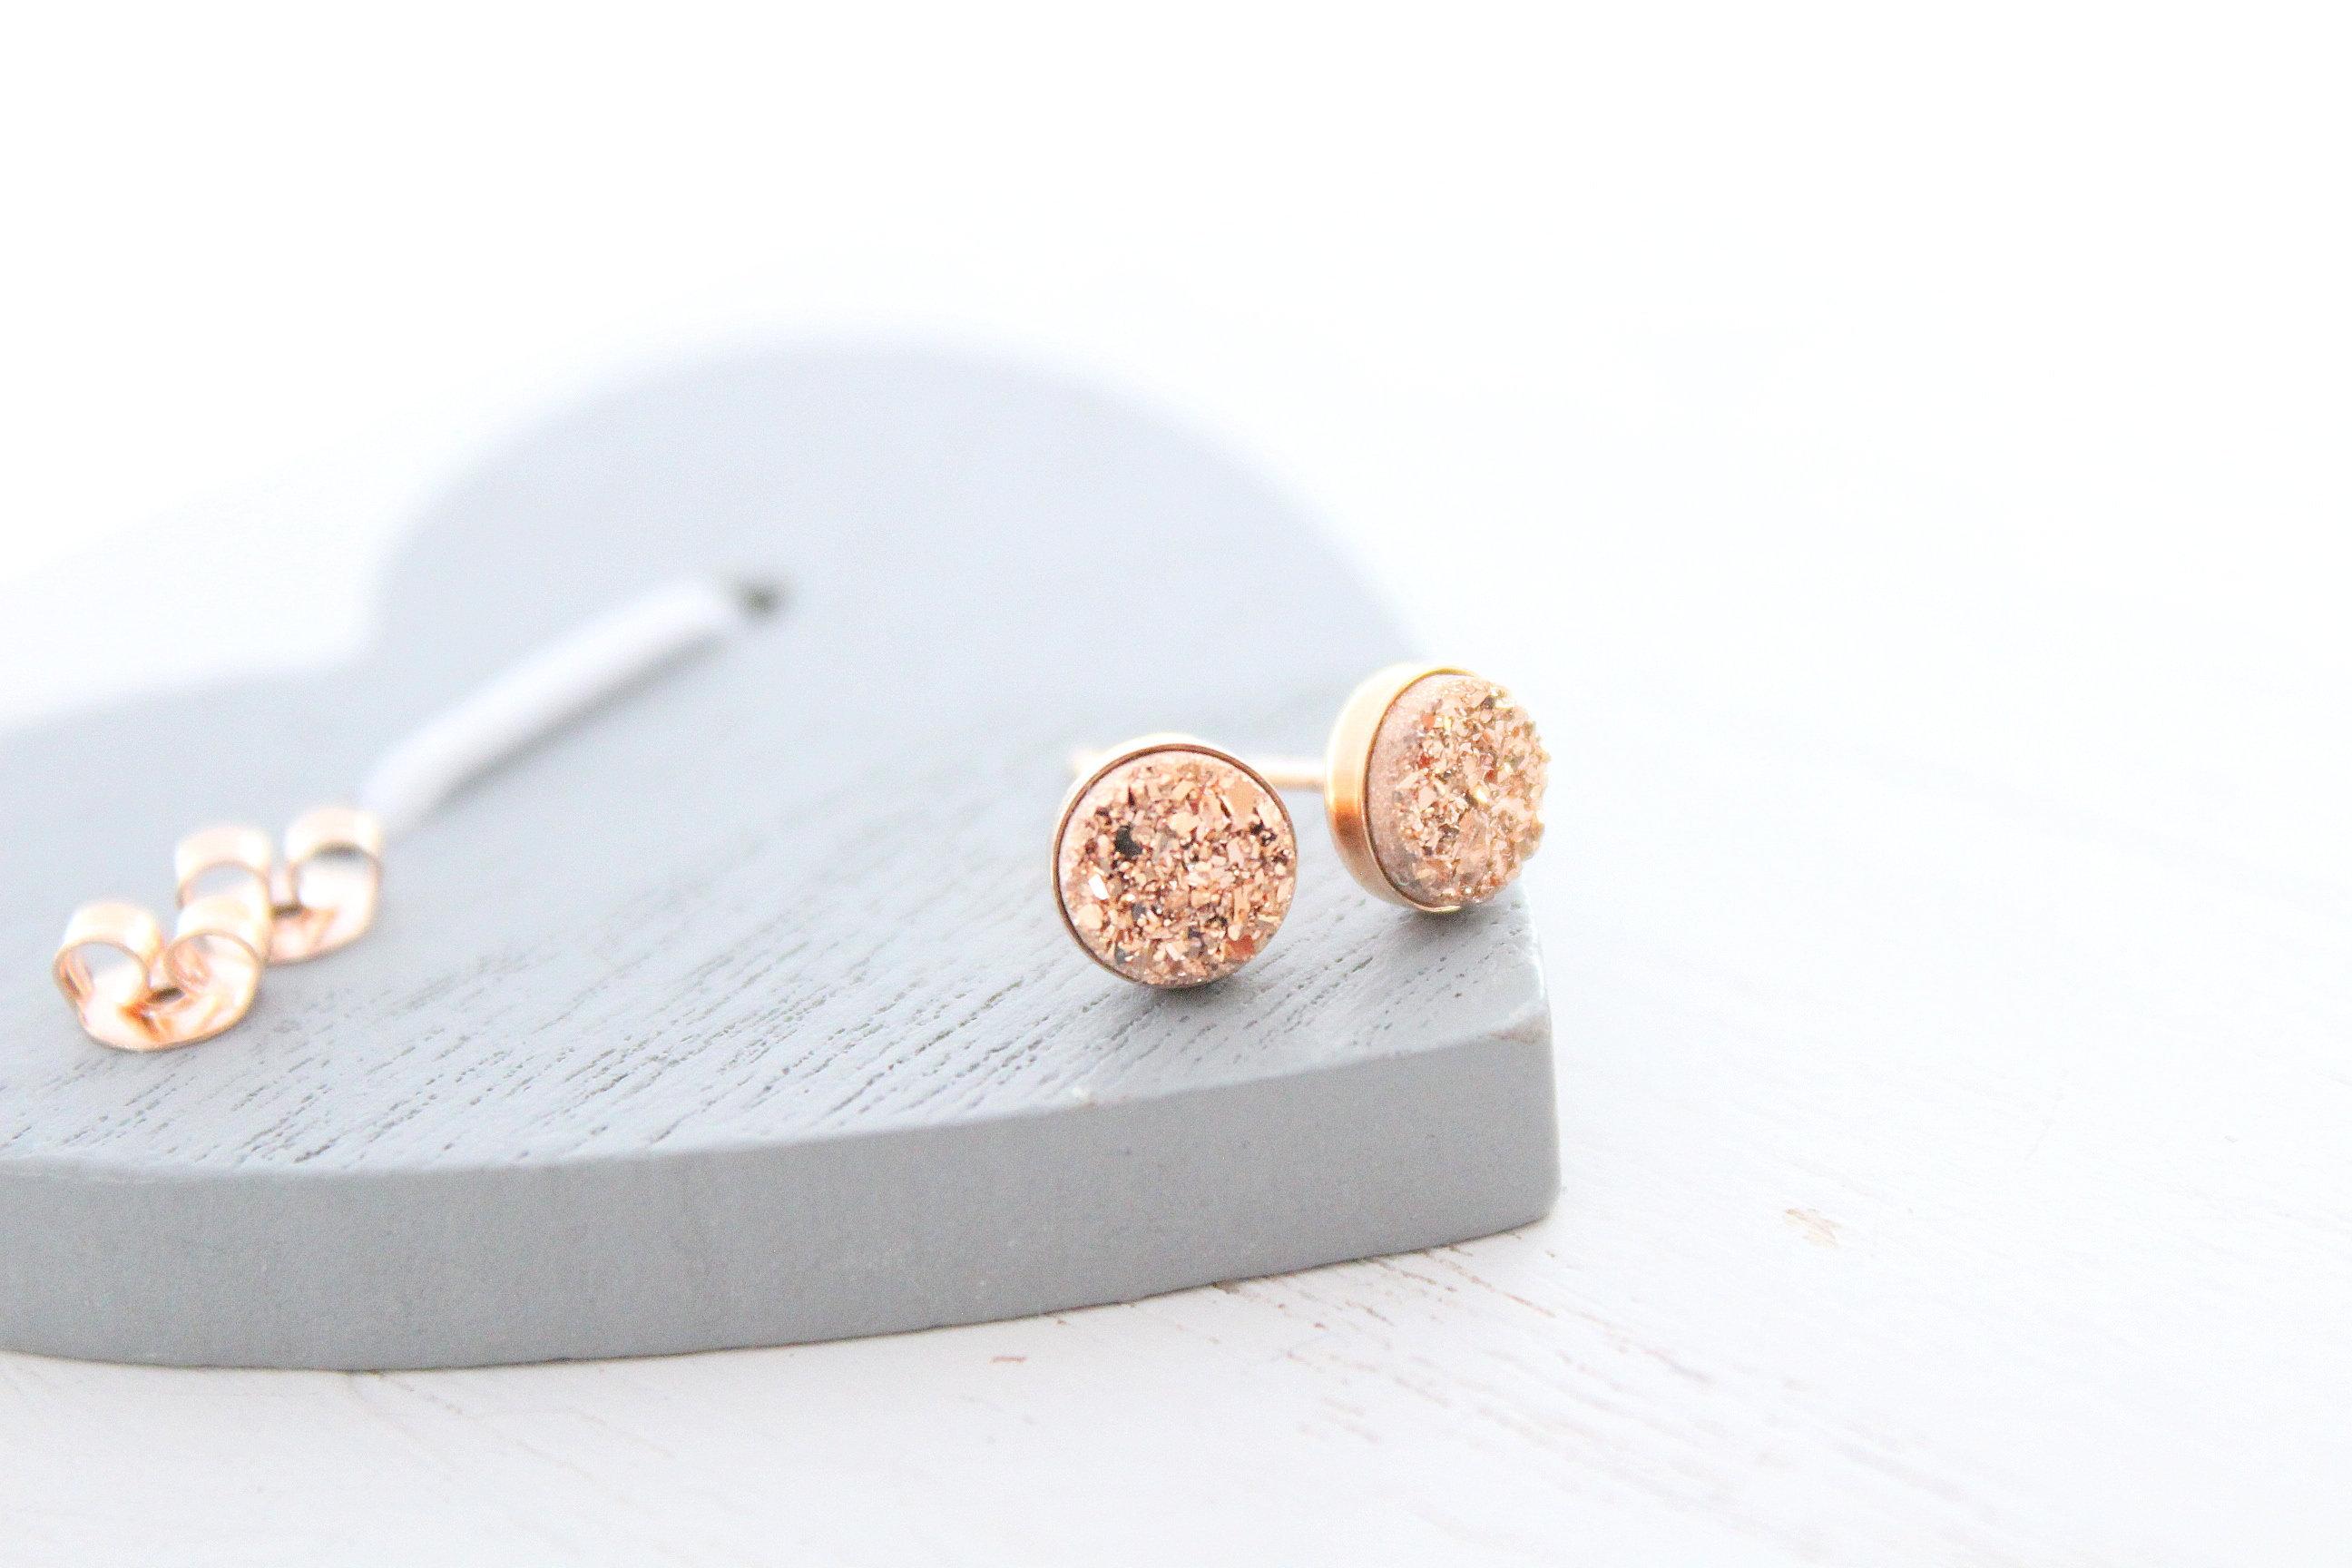 Rose Gold Druzy Stud Earrings Rose Gold Stud Earrings Rose Gold Druzy Earrings